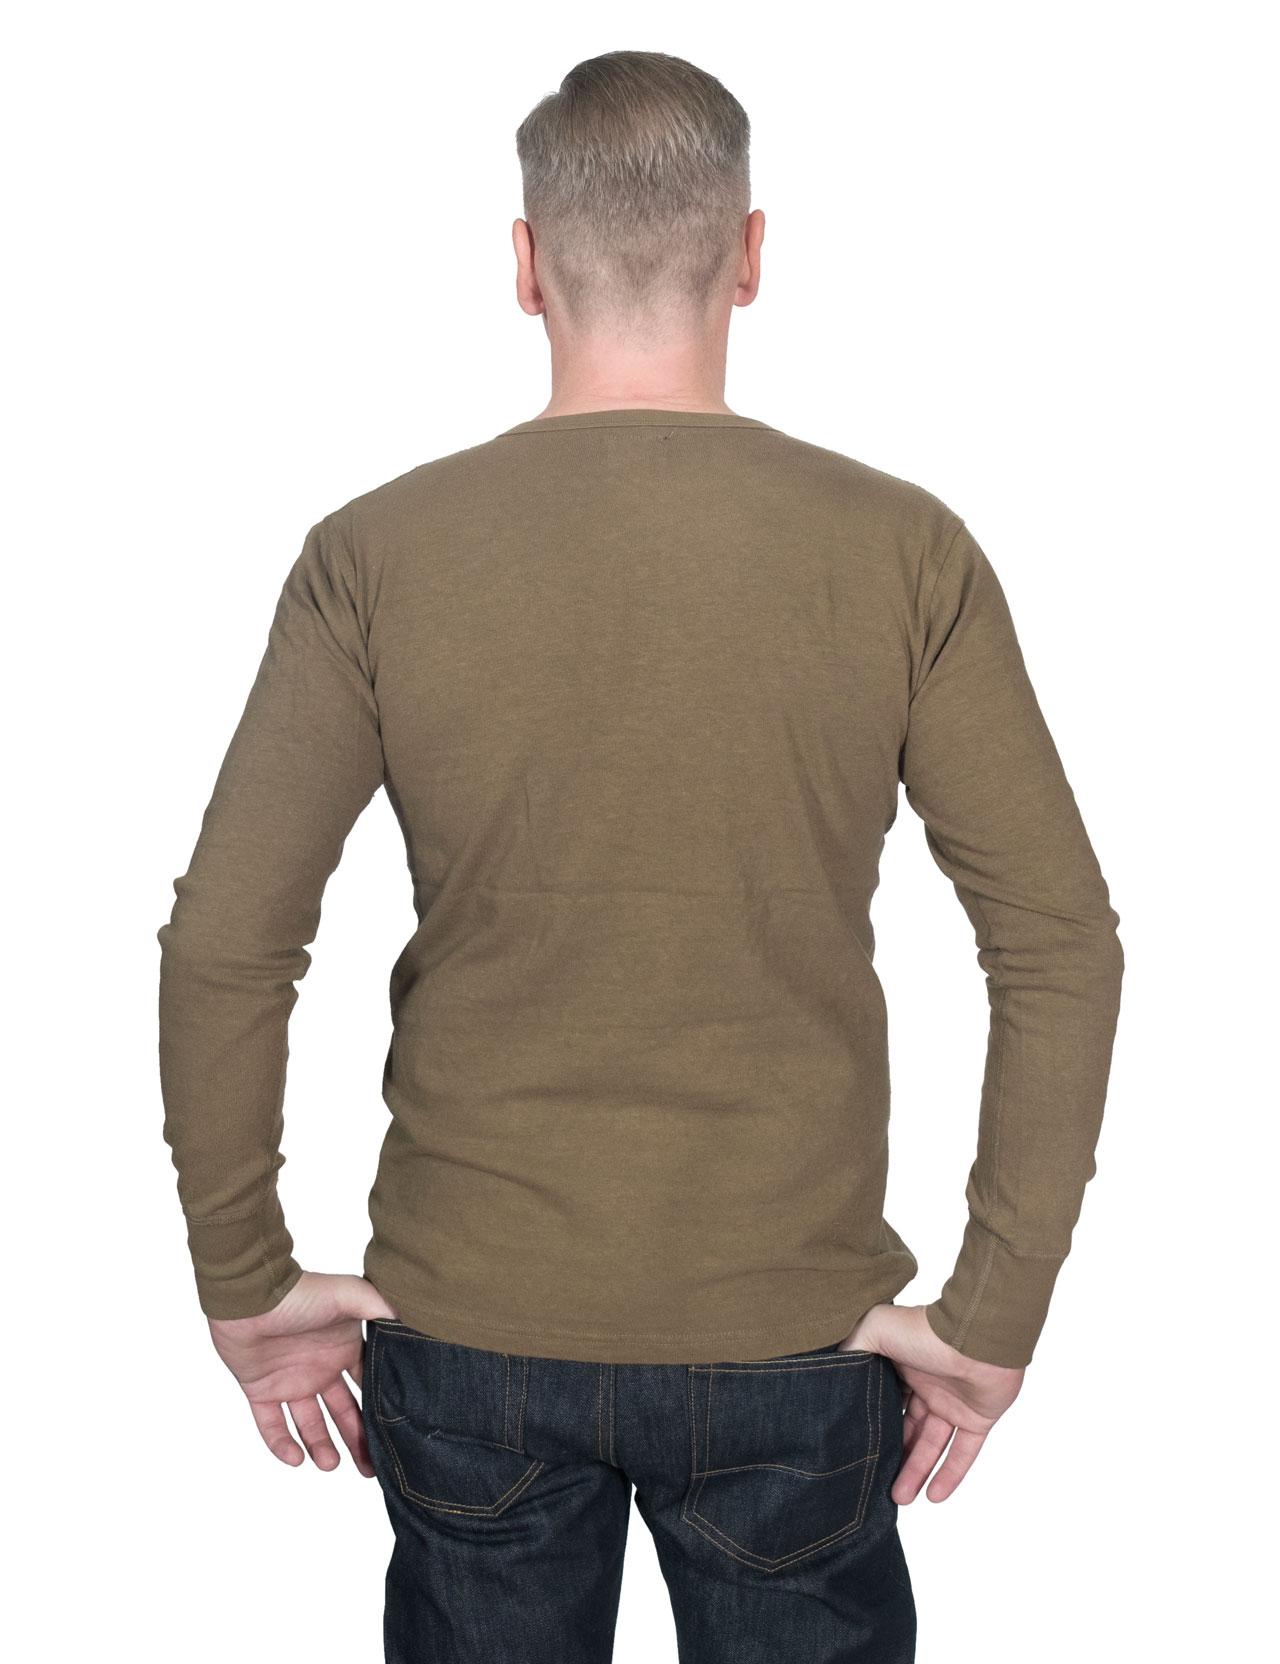 b91f89ab54f Homespun Knitwear - Lot 003 Surplus Henley Long Sleeve - Olive Drab